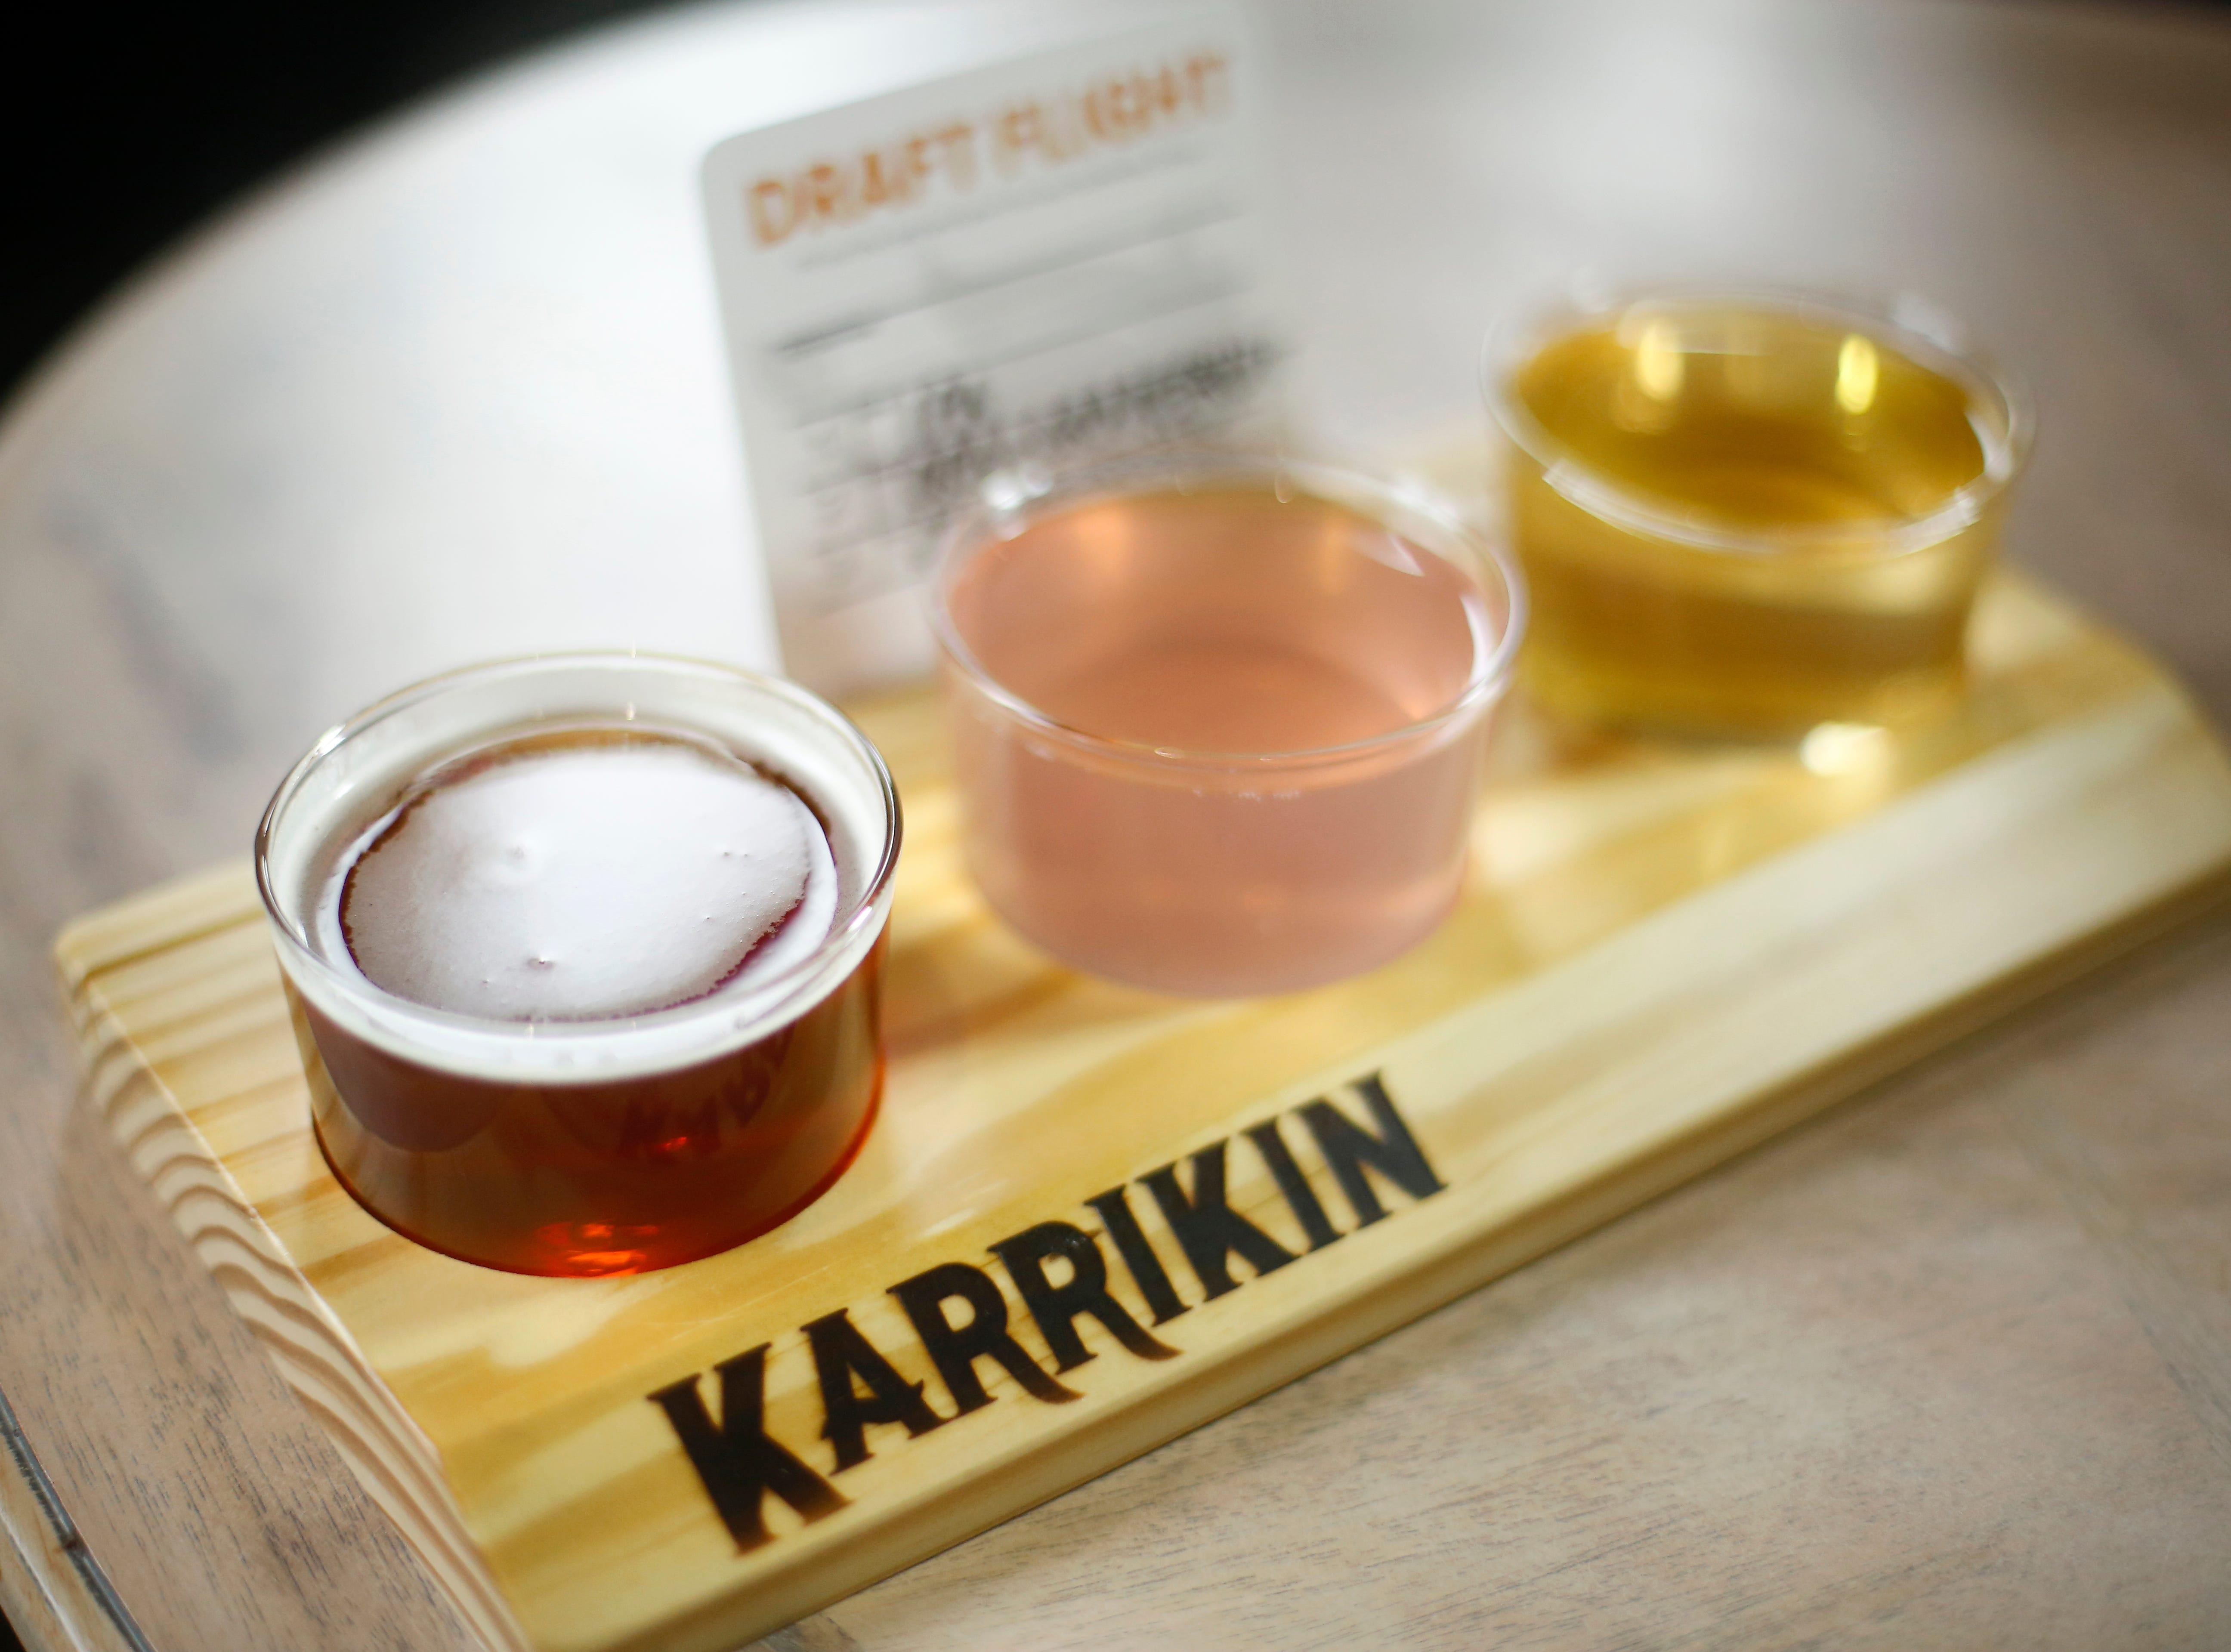 A flight of beer at Karrikin Spirits Co. in the Fairfax neighborhood of Cincinnati on Thursday, Jan. 31, 2019.